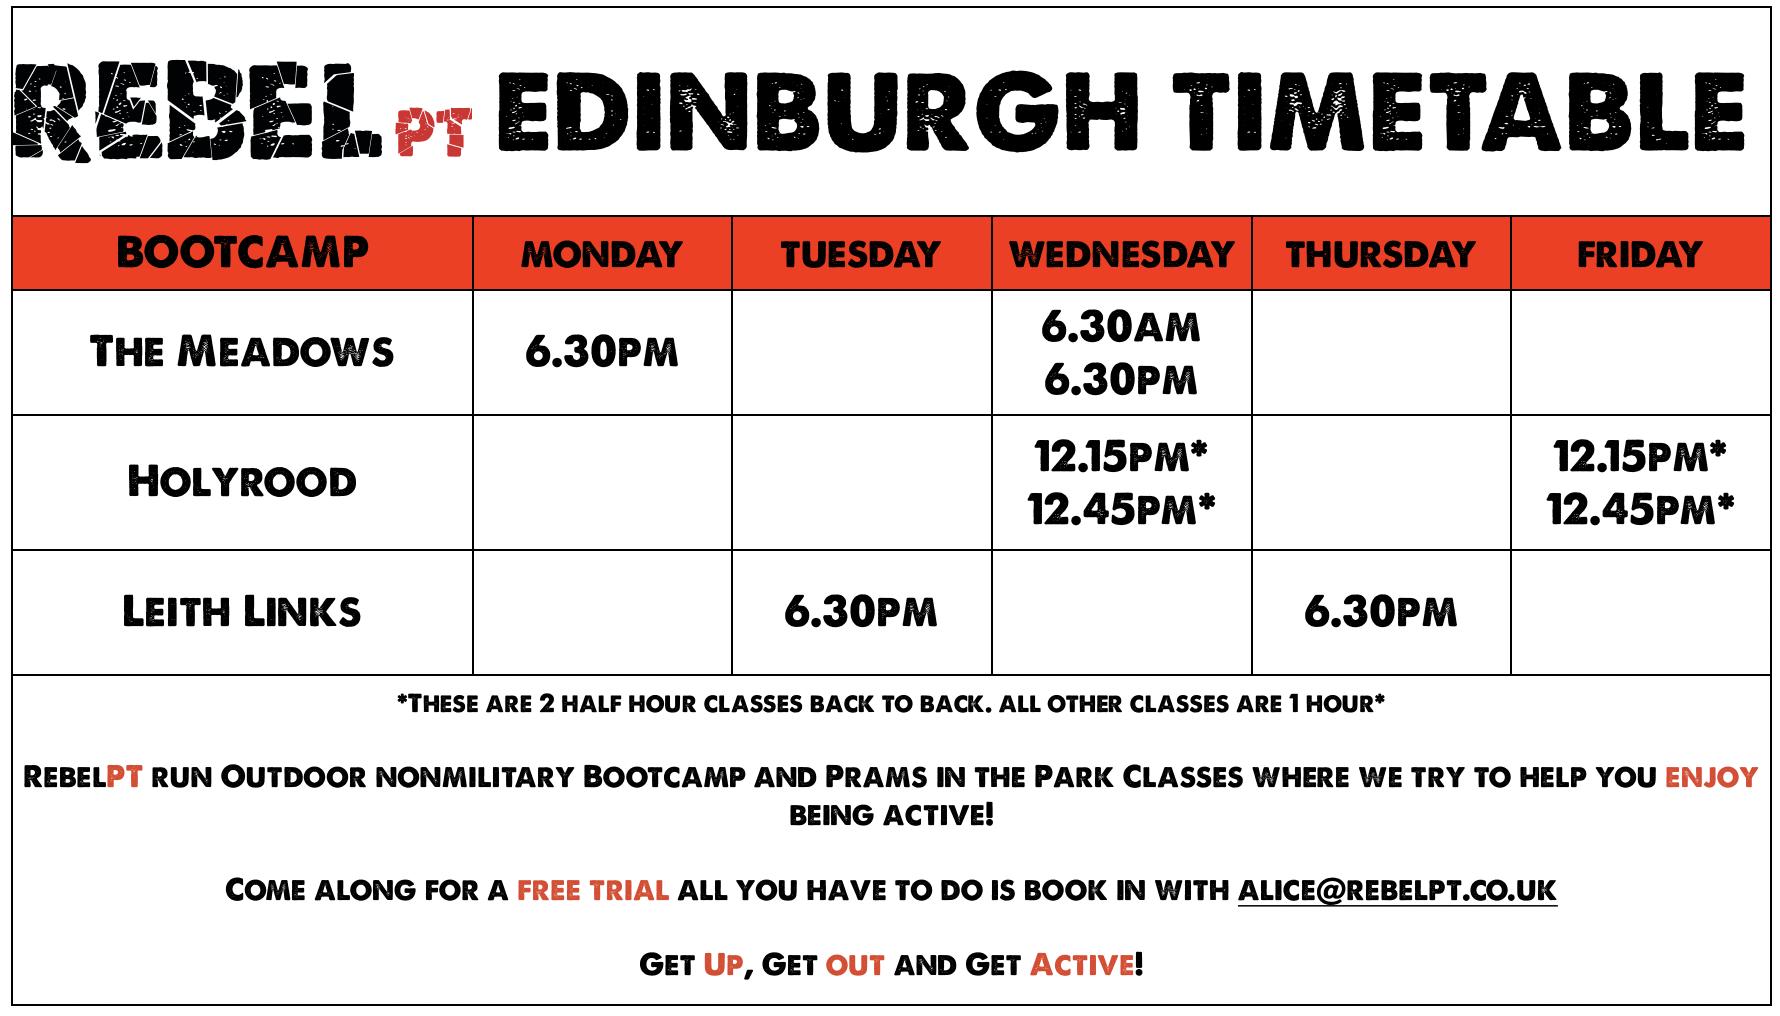 Edinburgh Timetable